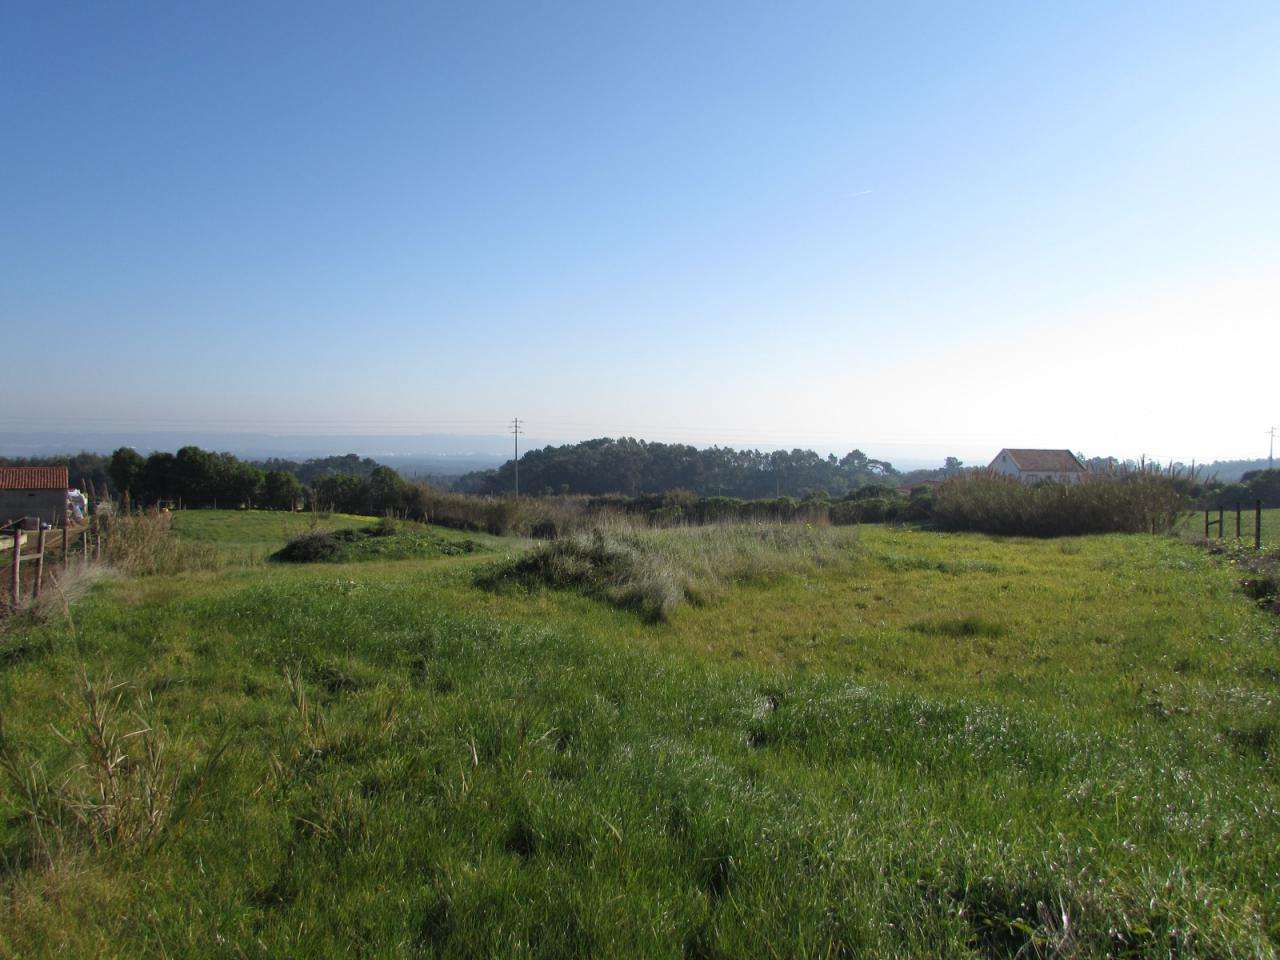 Terreno para comprar, Caldas da Rainha - Santo Onofre e Serra do Bouro, Leiria - Foto 3